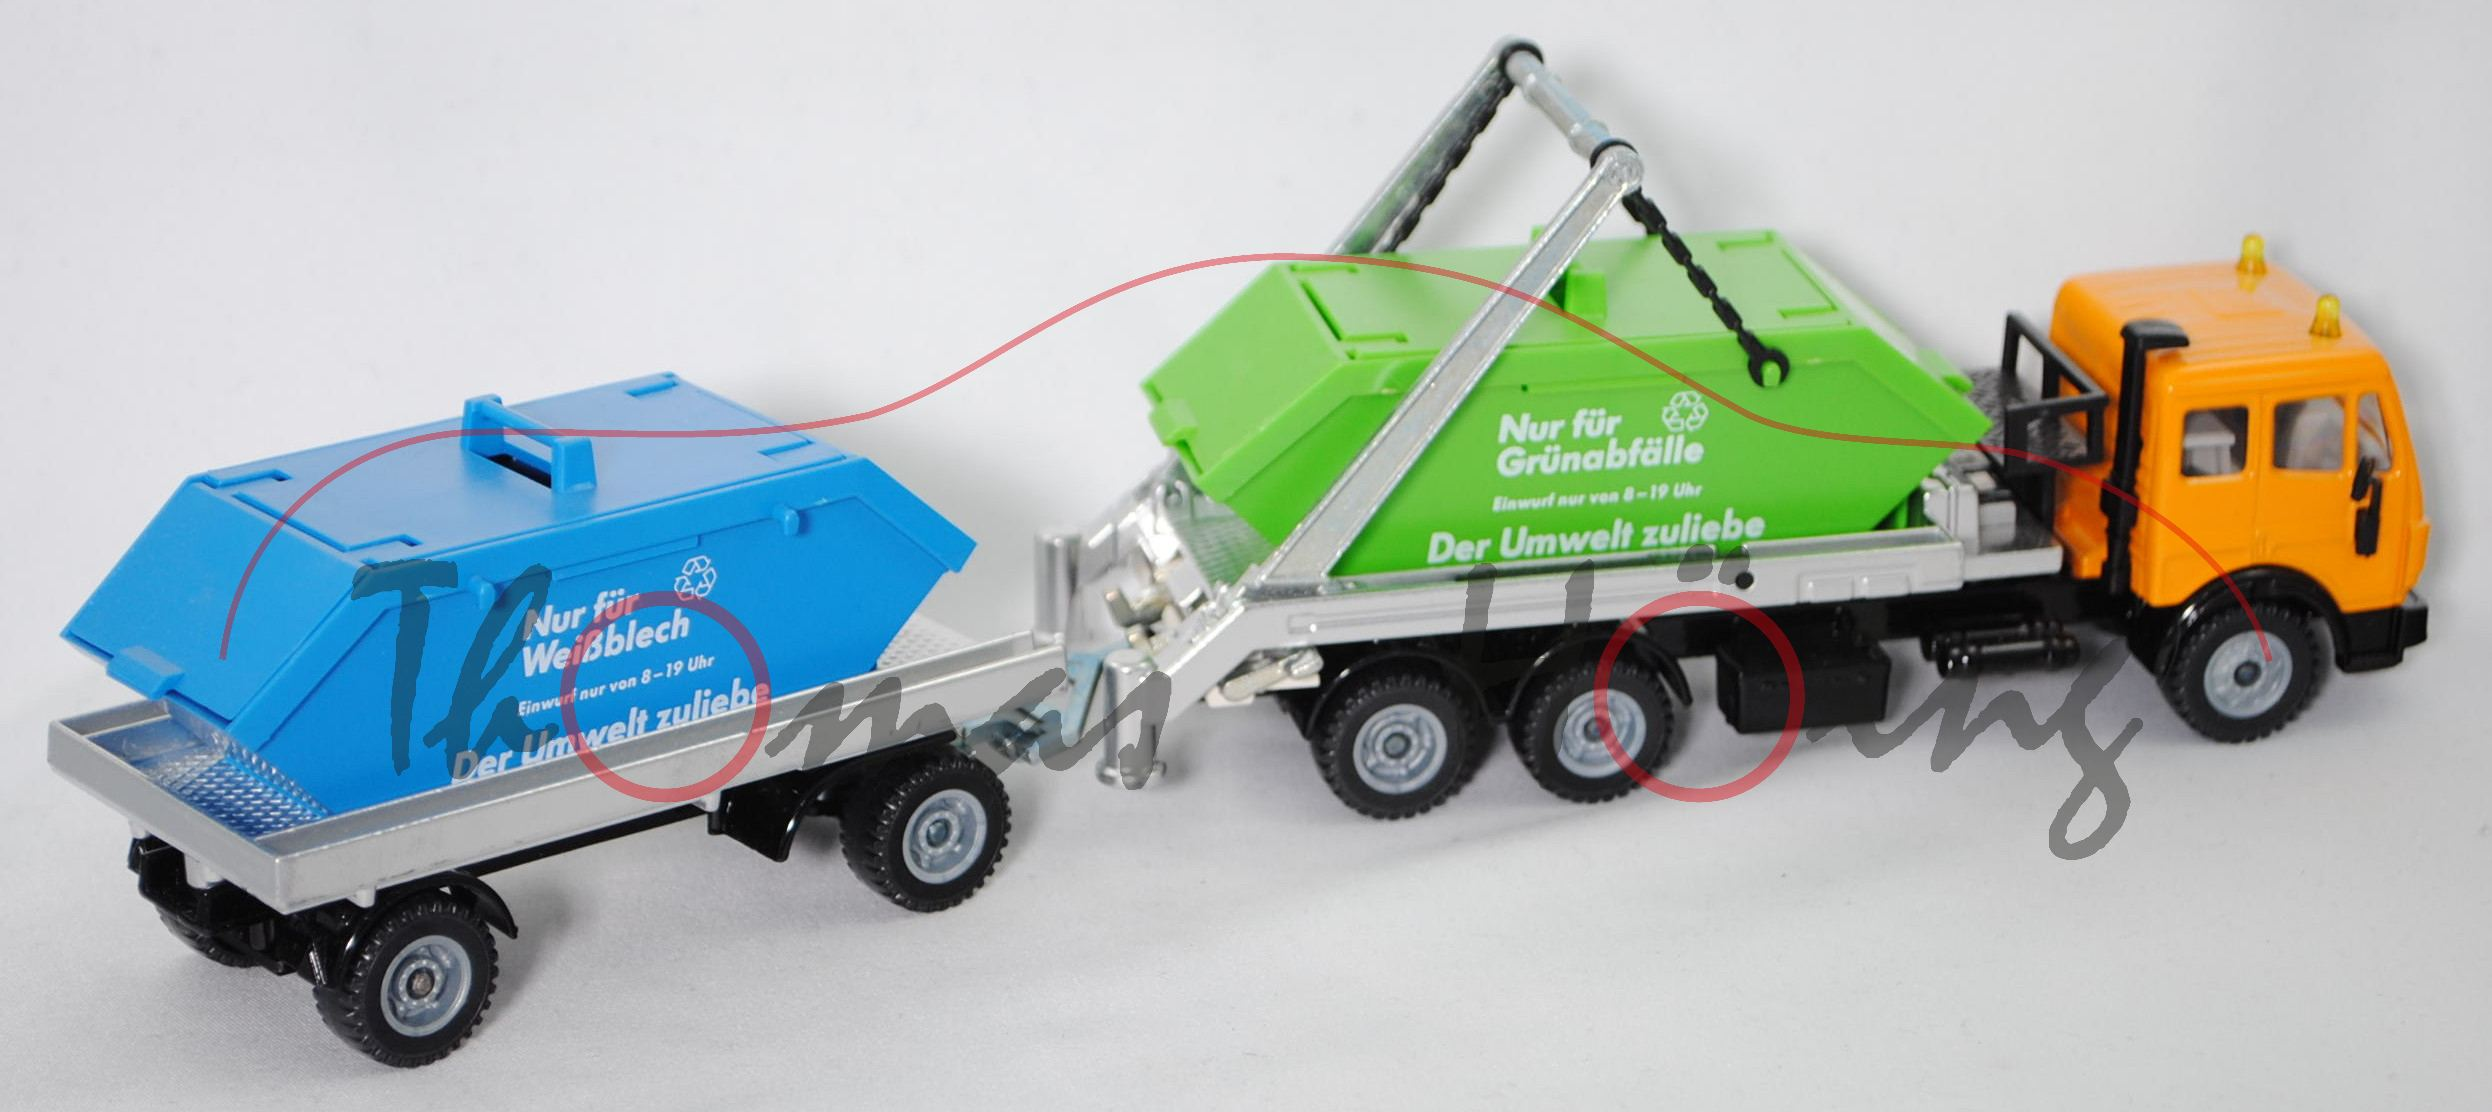 ca 1:55 Siku Super 3516 Mercedes-Benz SK 2629 6x2 Recycling-Absetzkipper